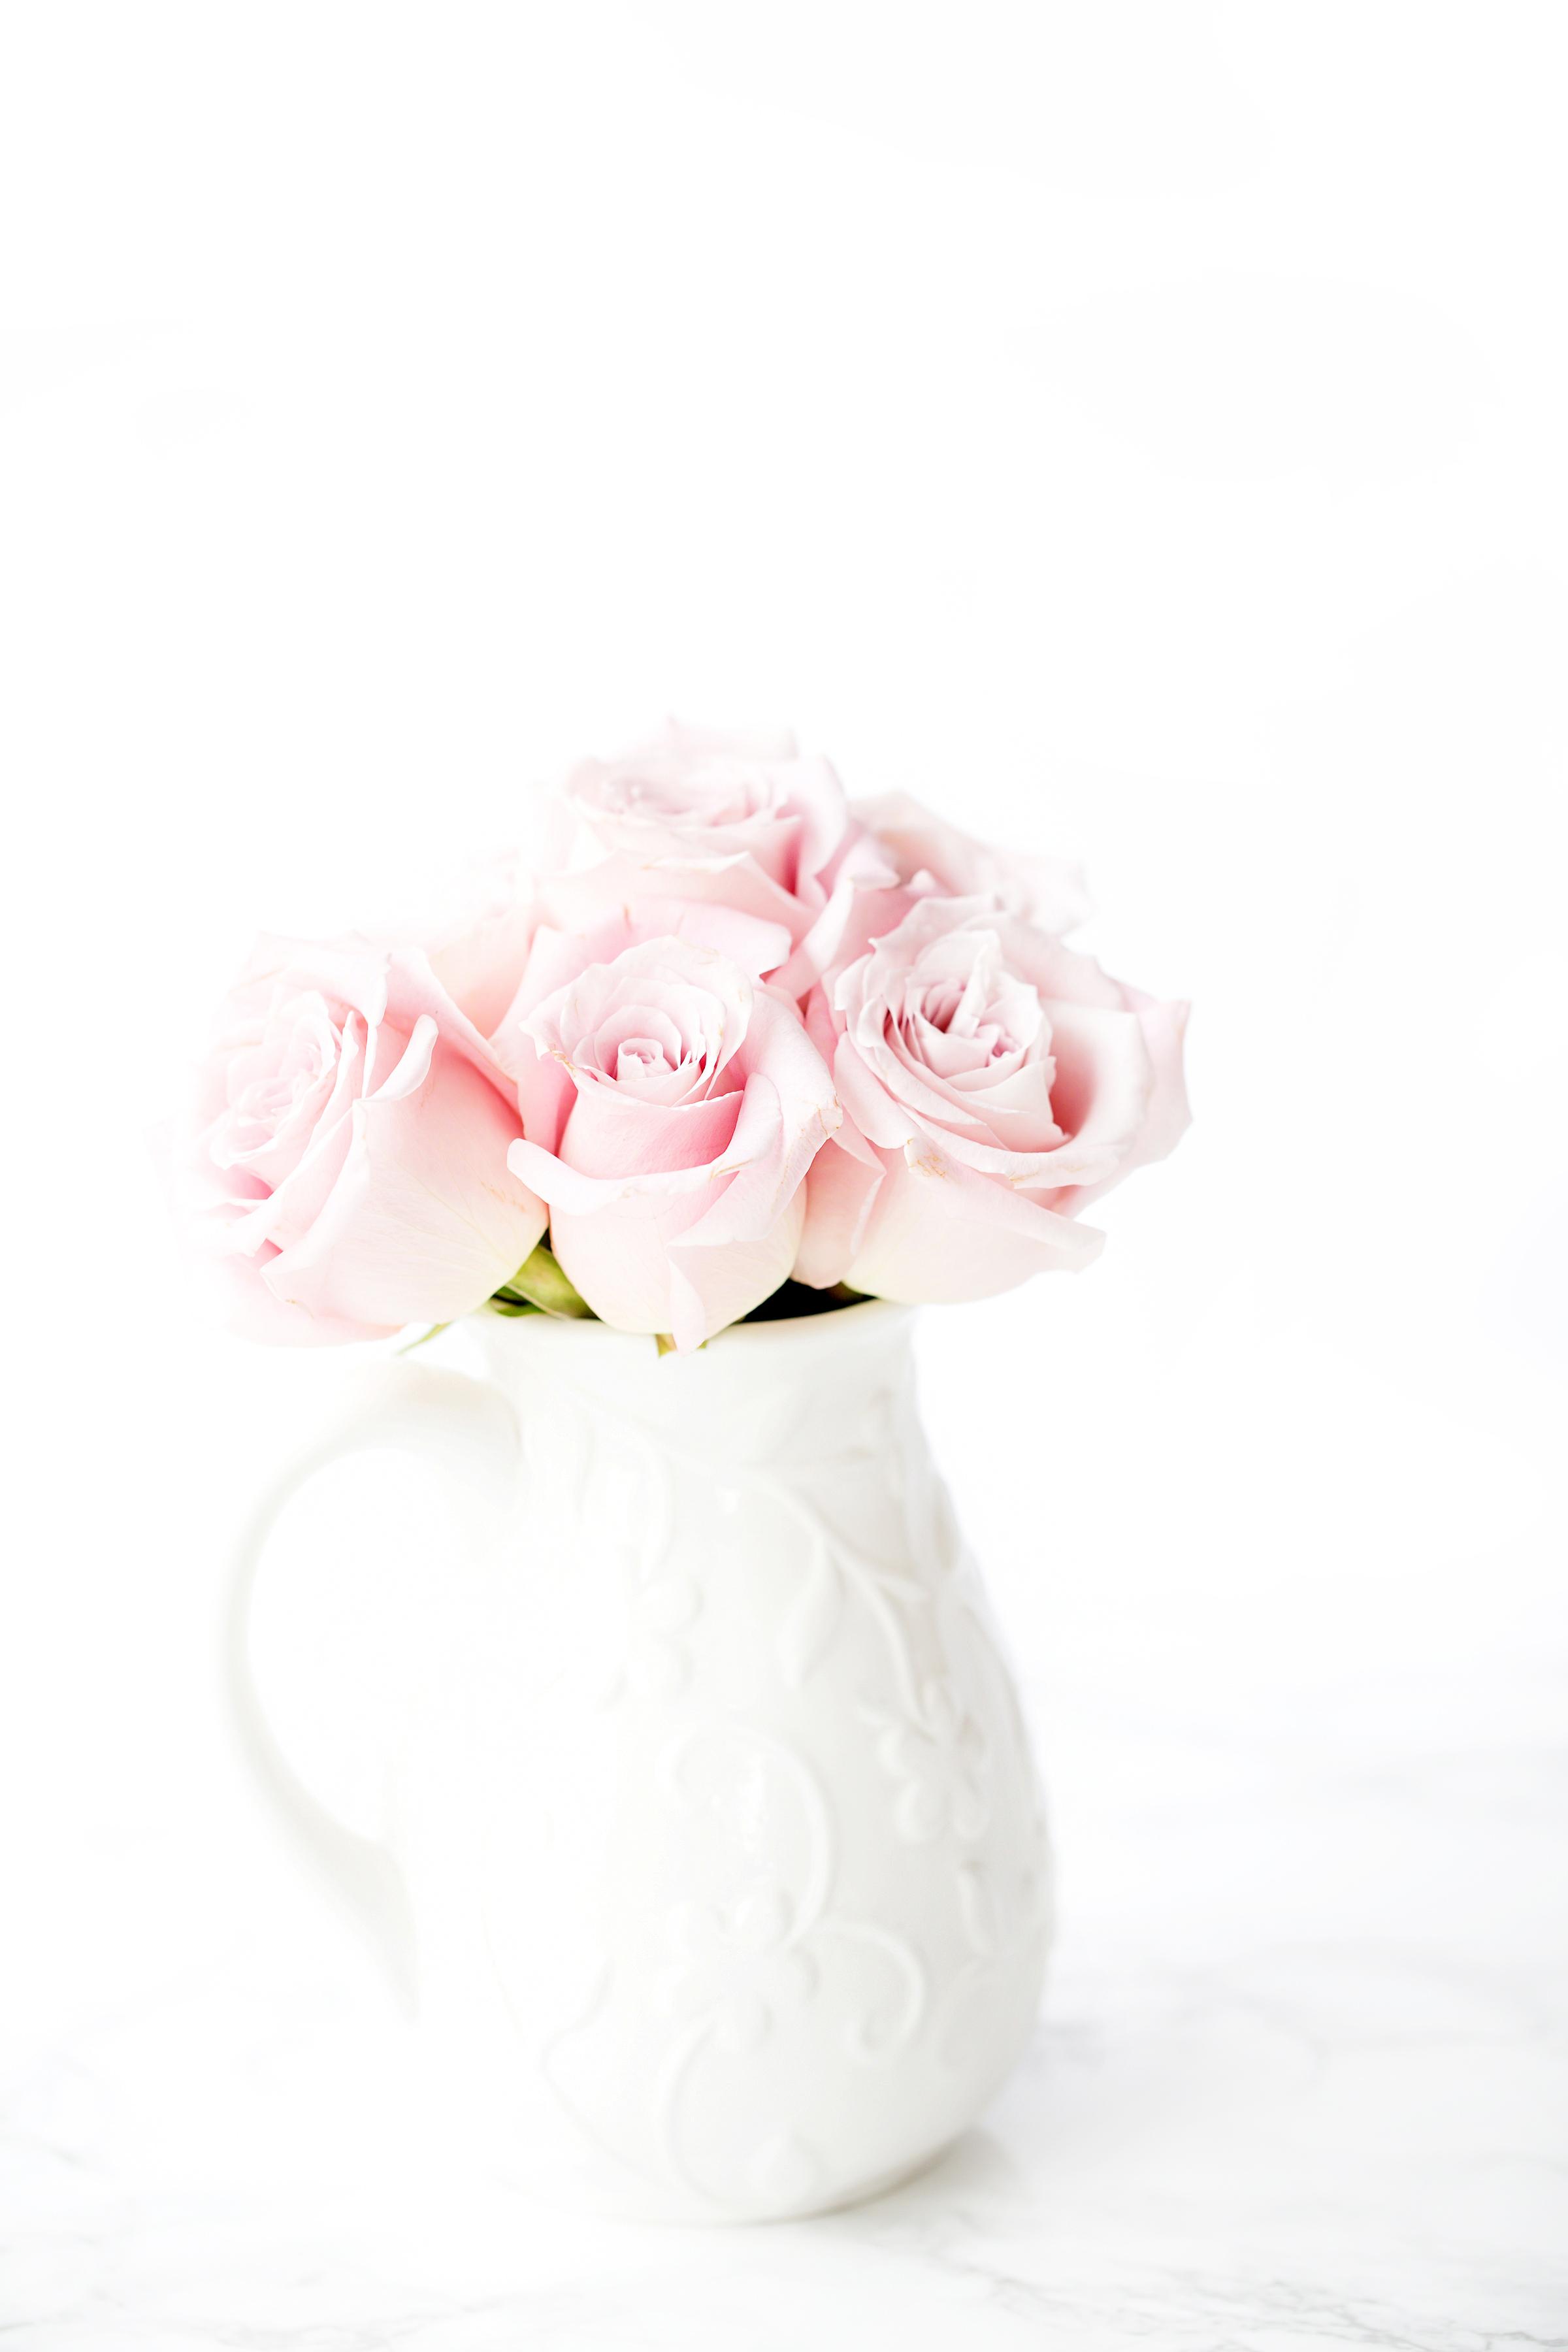 Fleursociety Selling